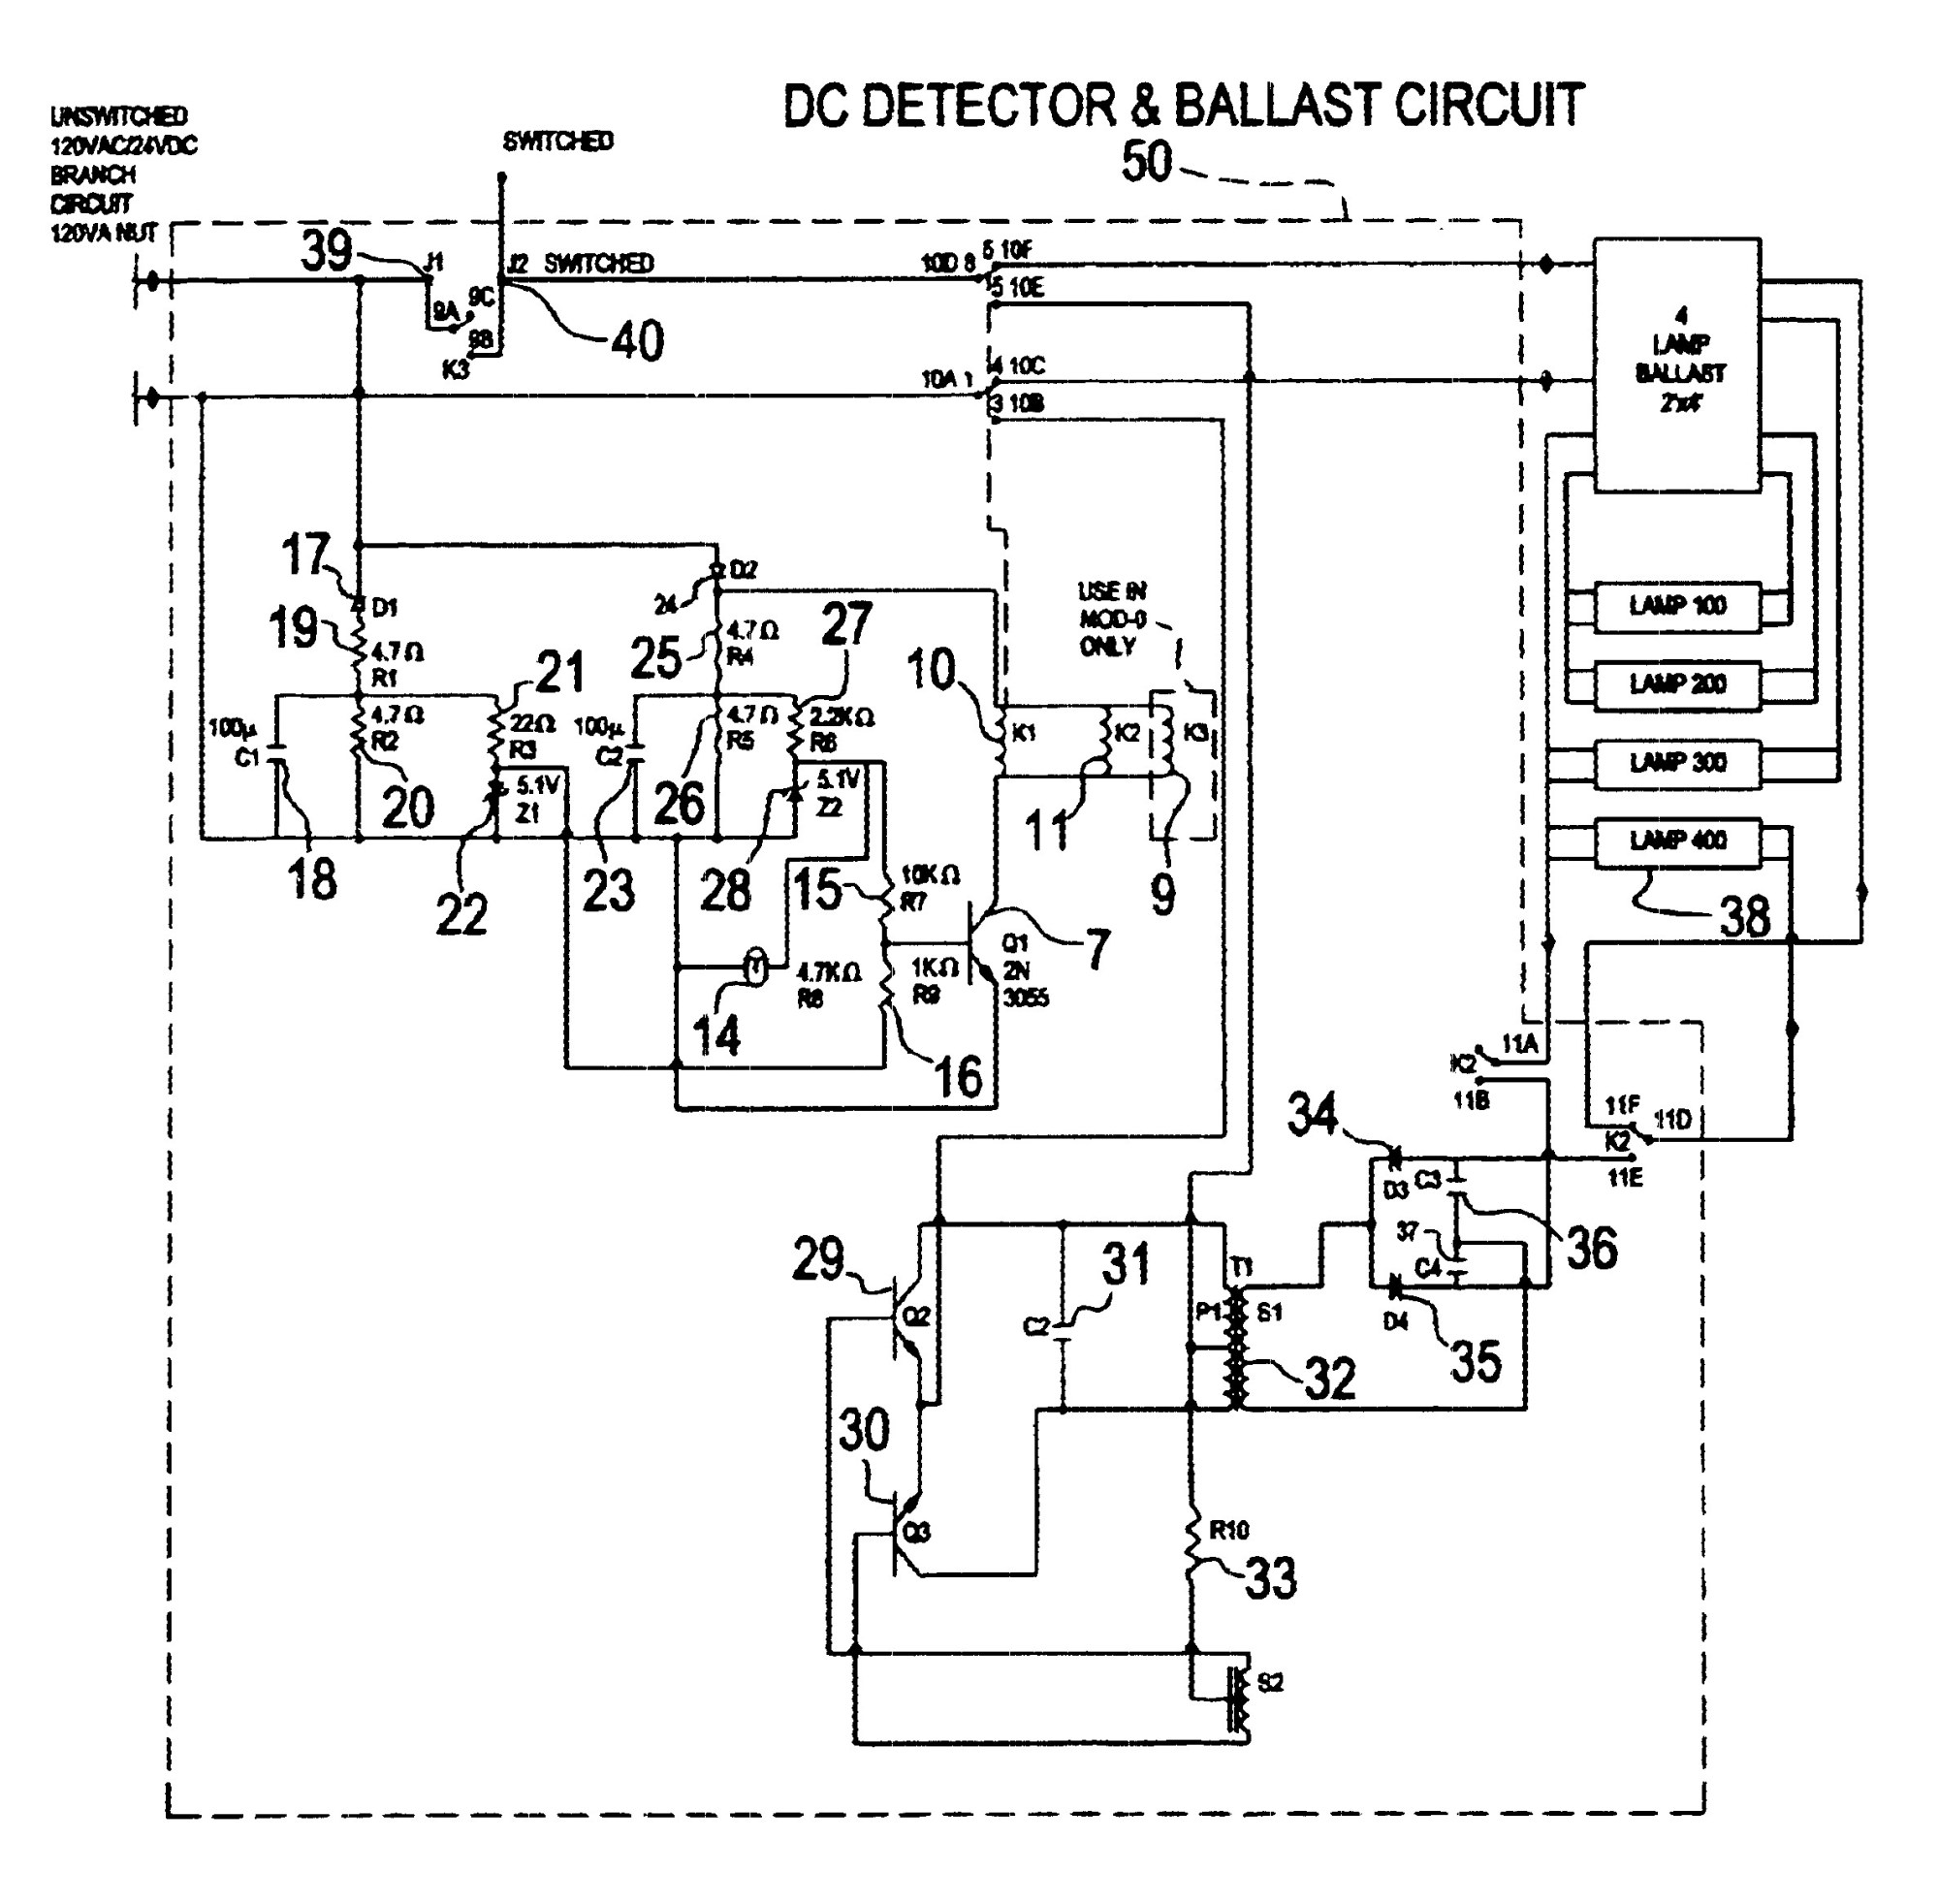 hight resolution of bodine emergency ballast wiring diagram b100 fluorescent